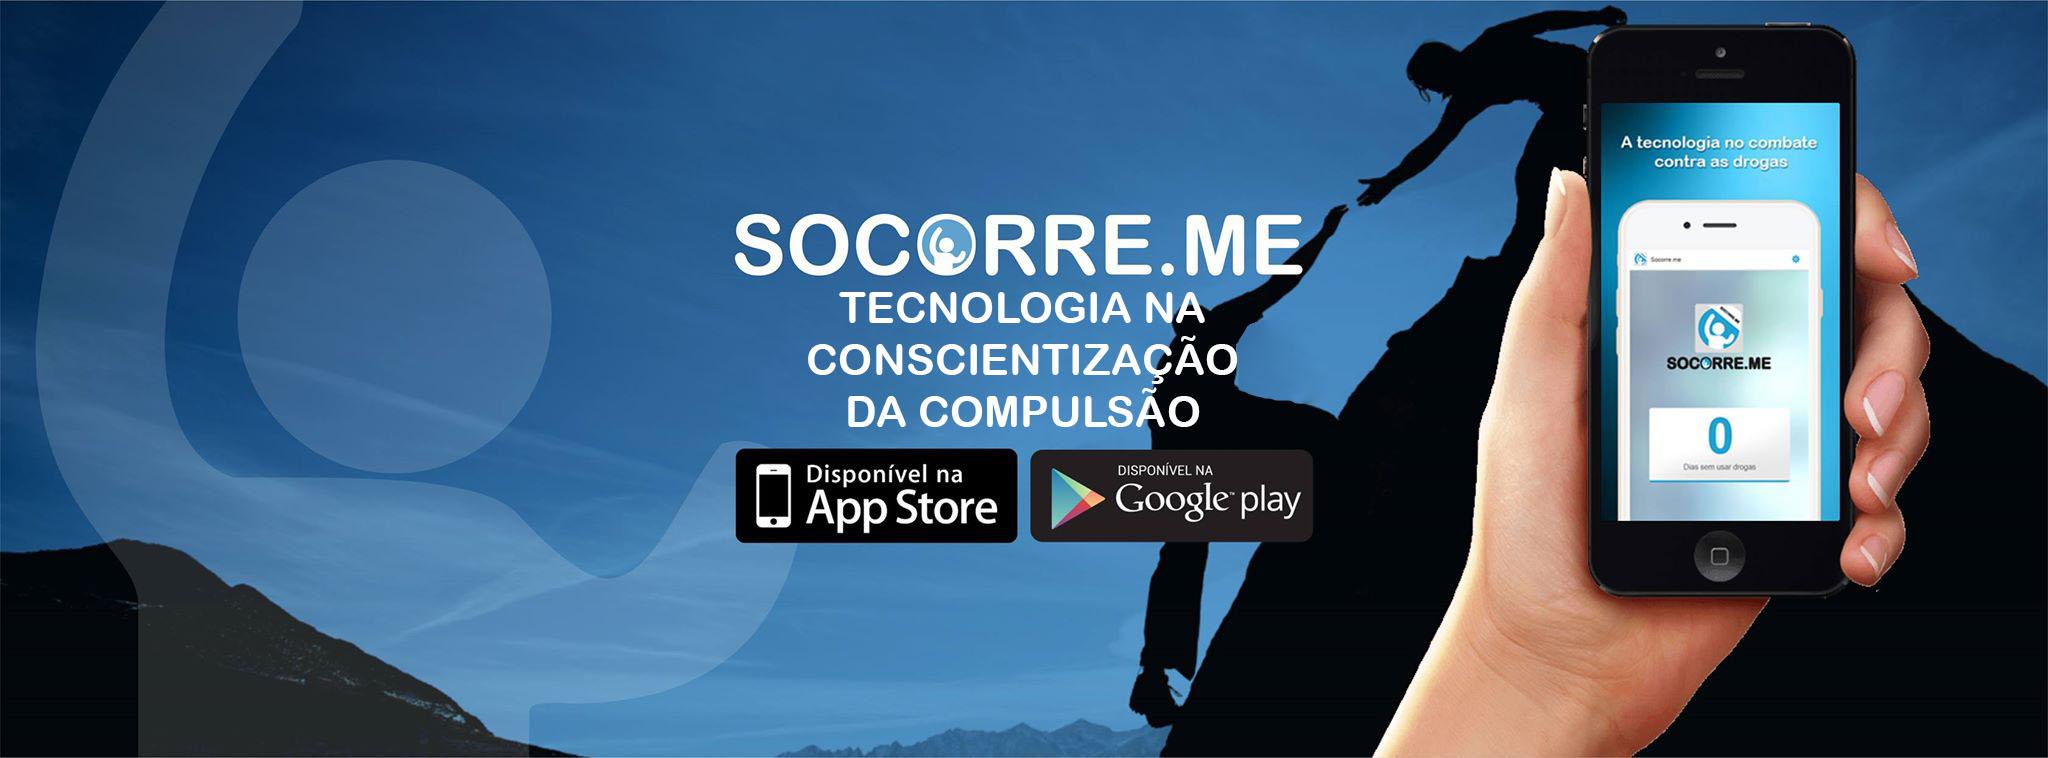 Blog Socorre.me